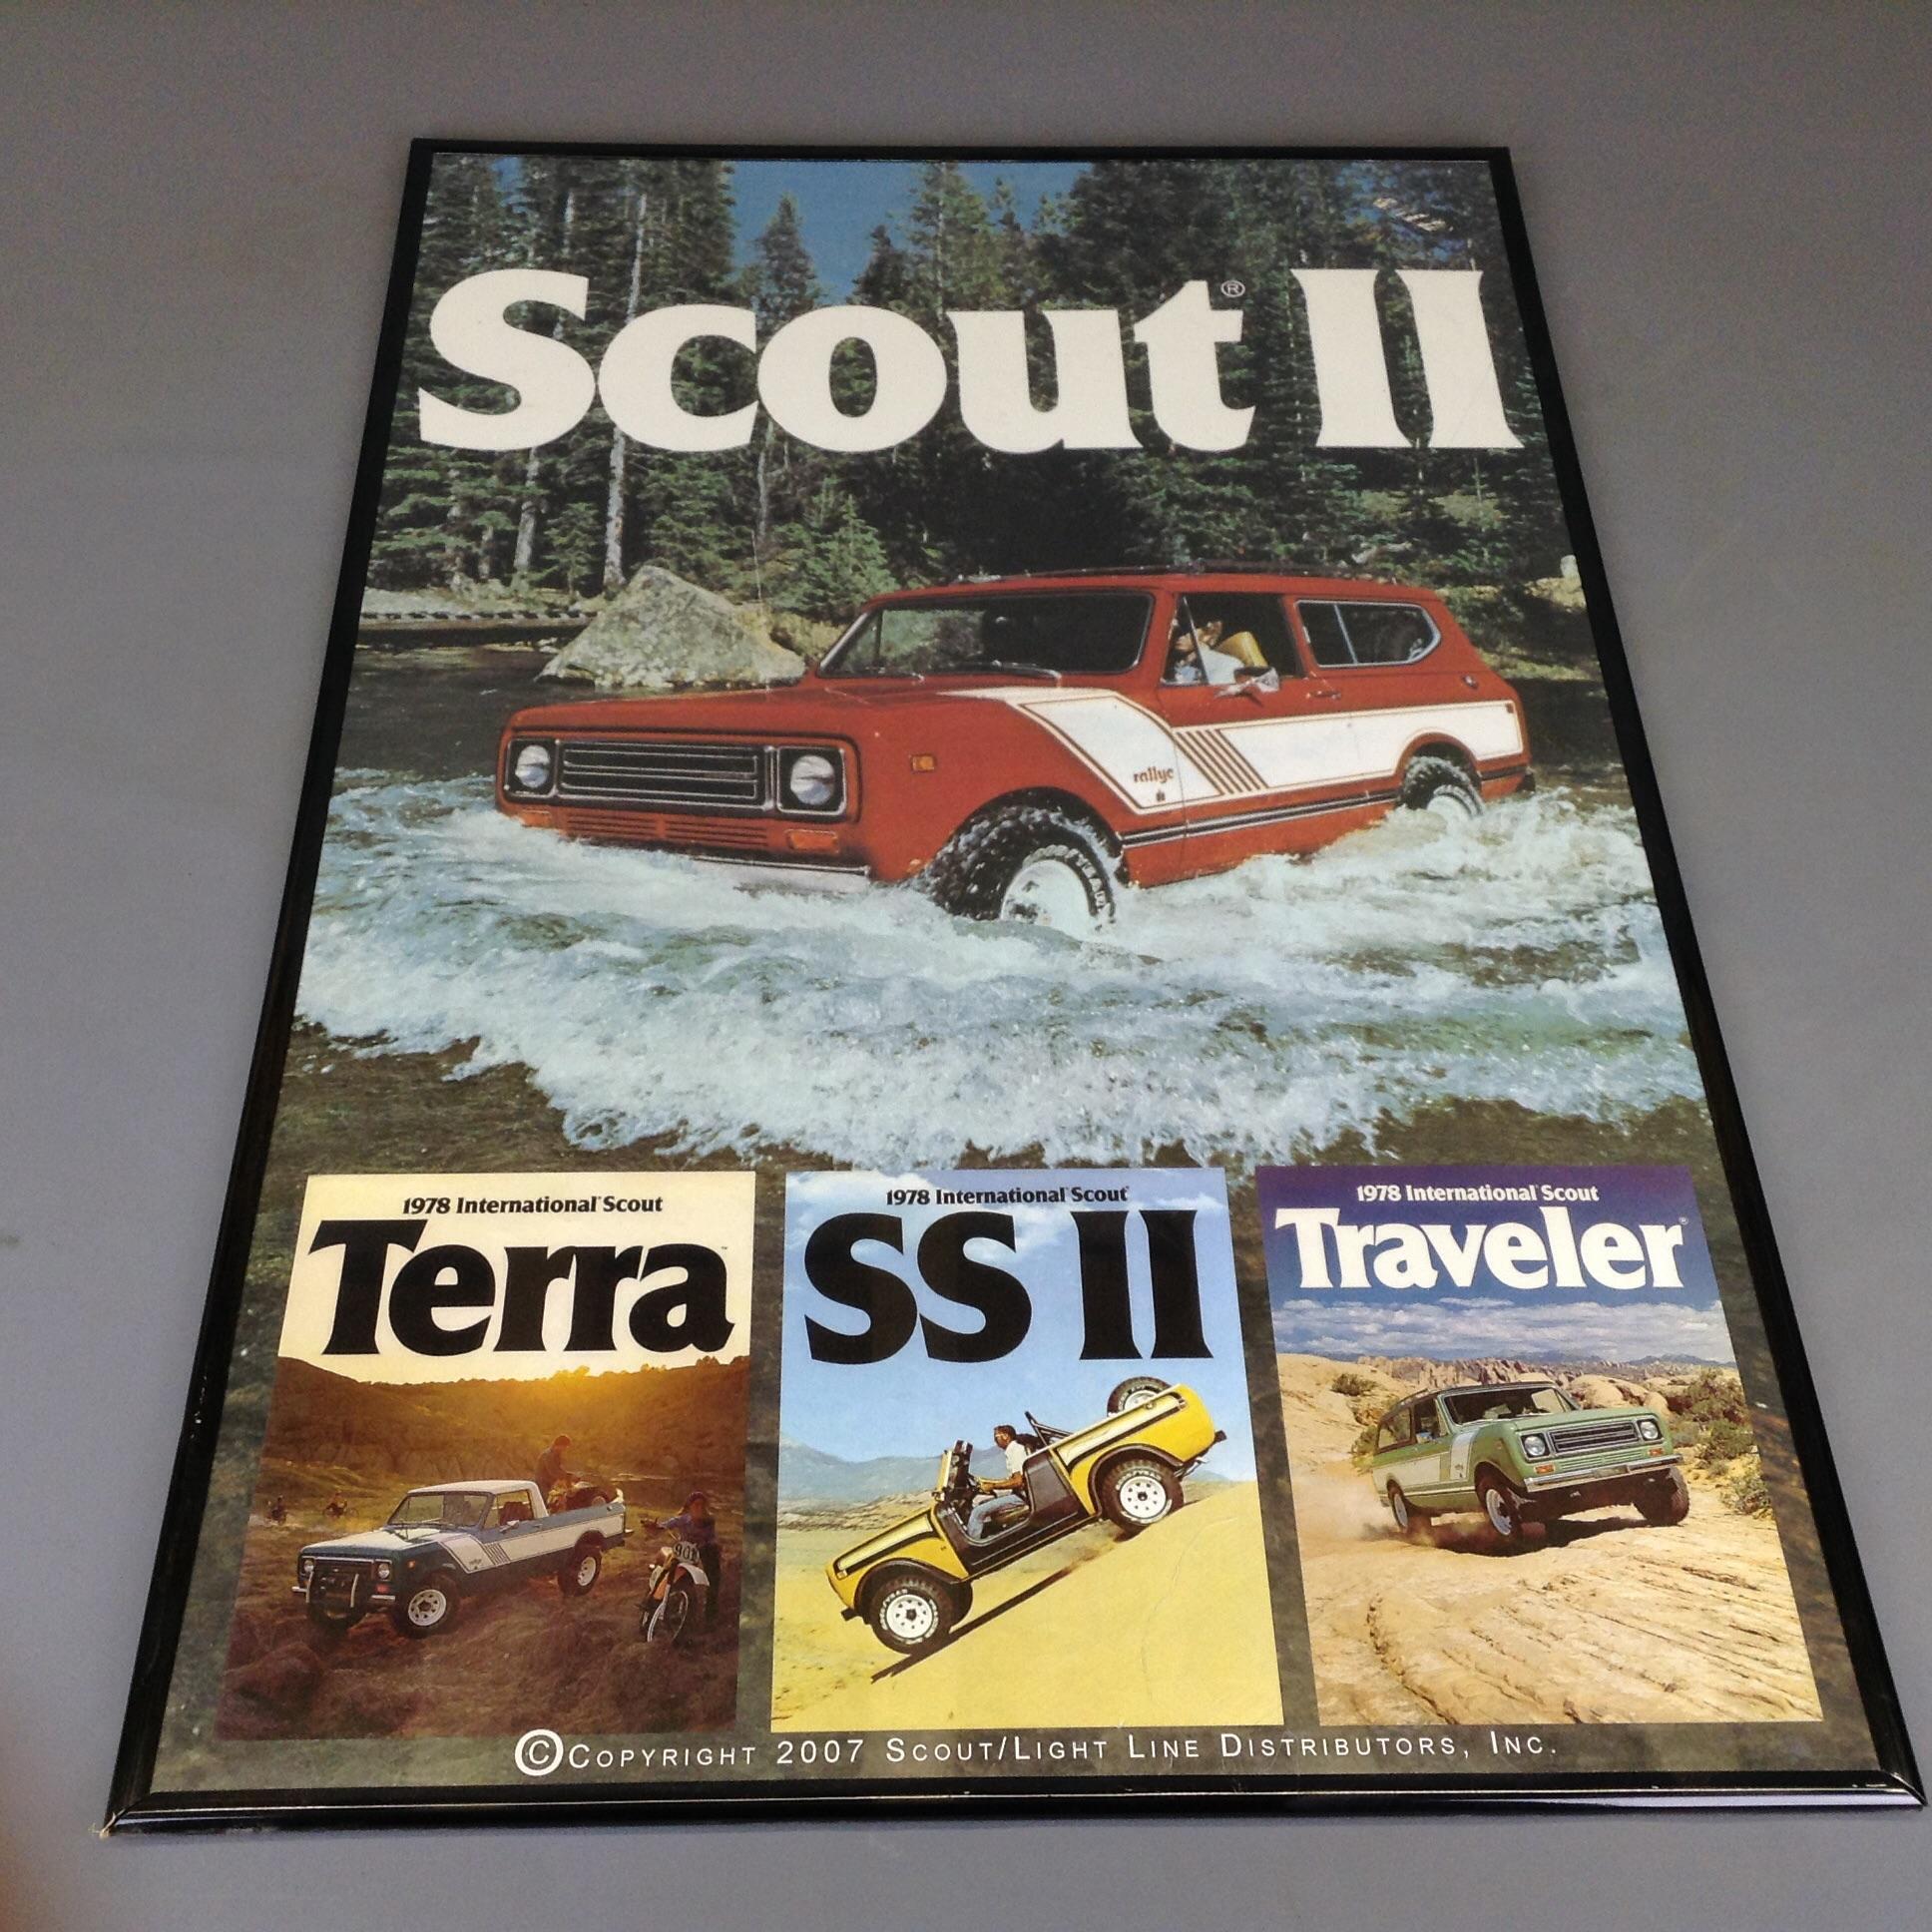 Scout II, Terra, Traveler, SSII Poster